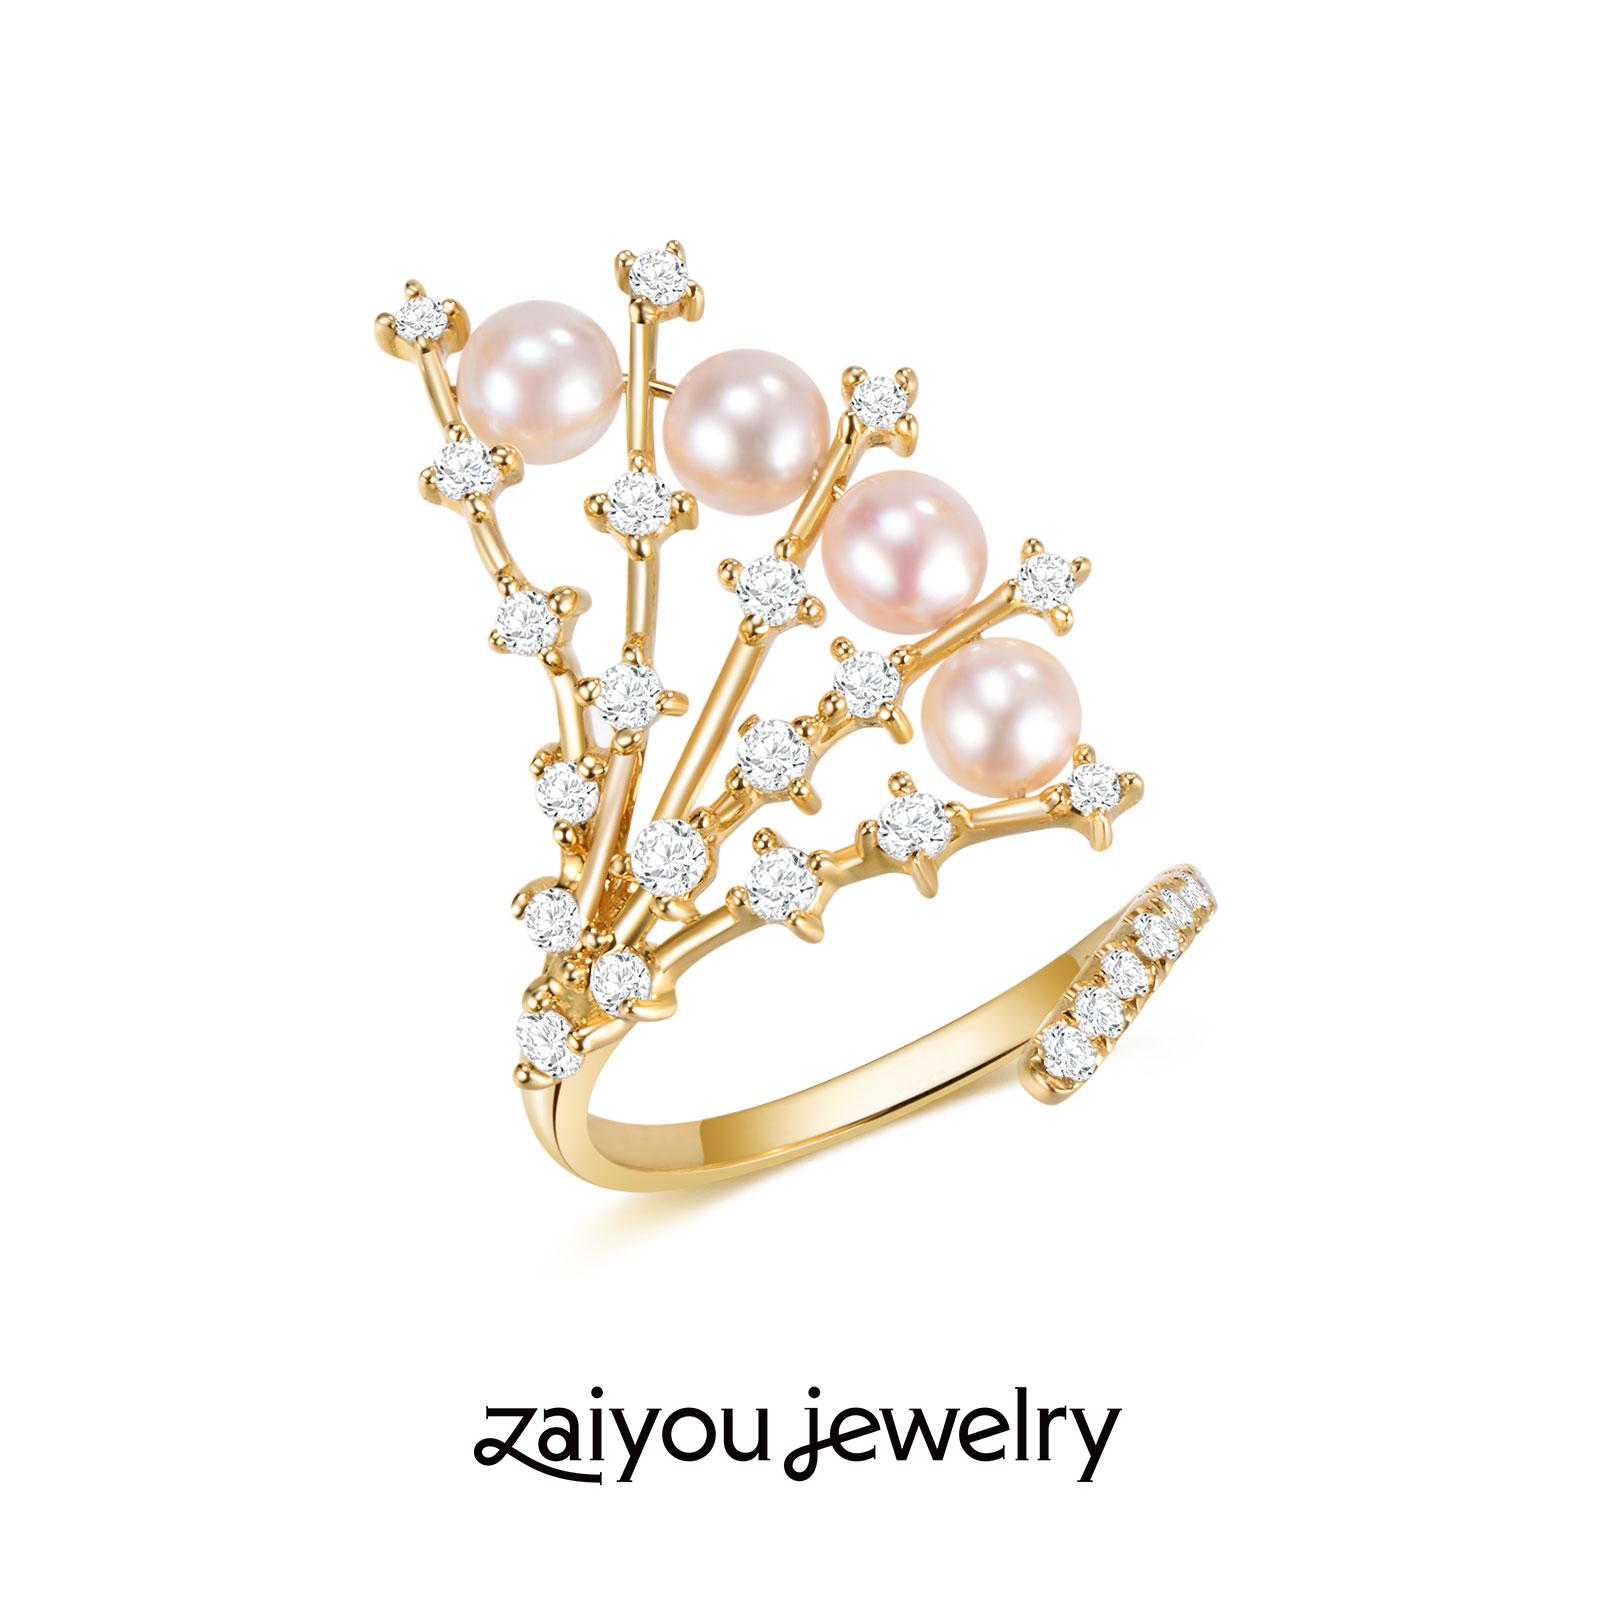 [pearl fan] Qile zaiyou design series K gold Akoya pearl art creative artificial diamond jewelry ring